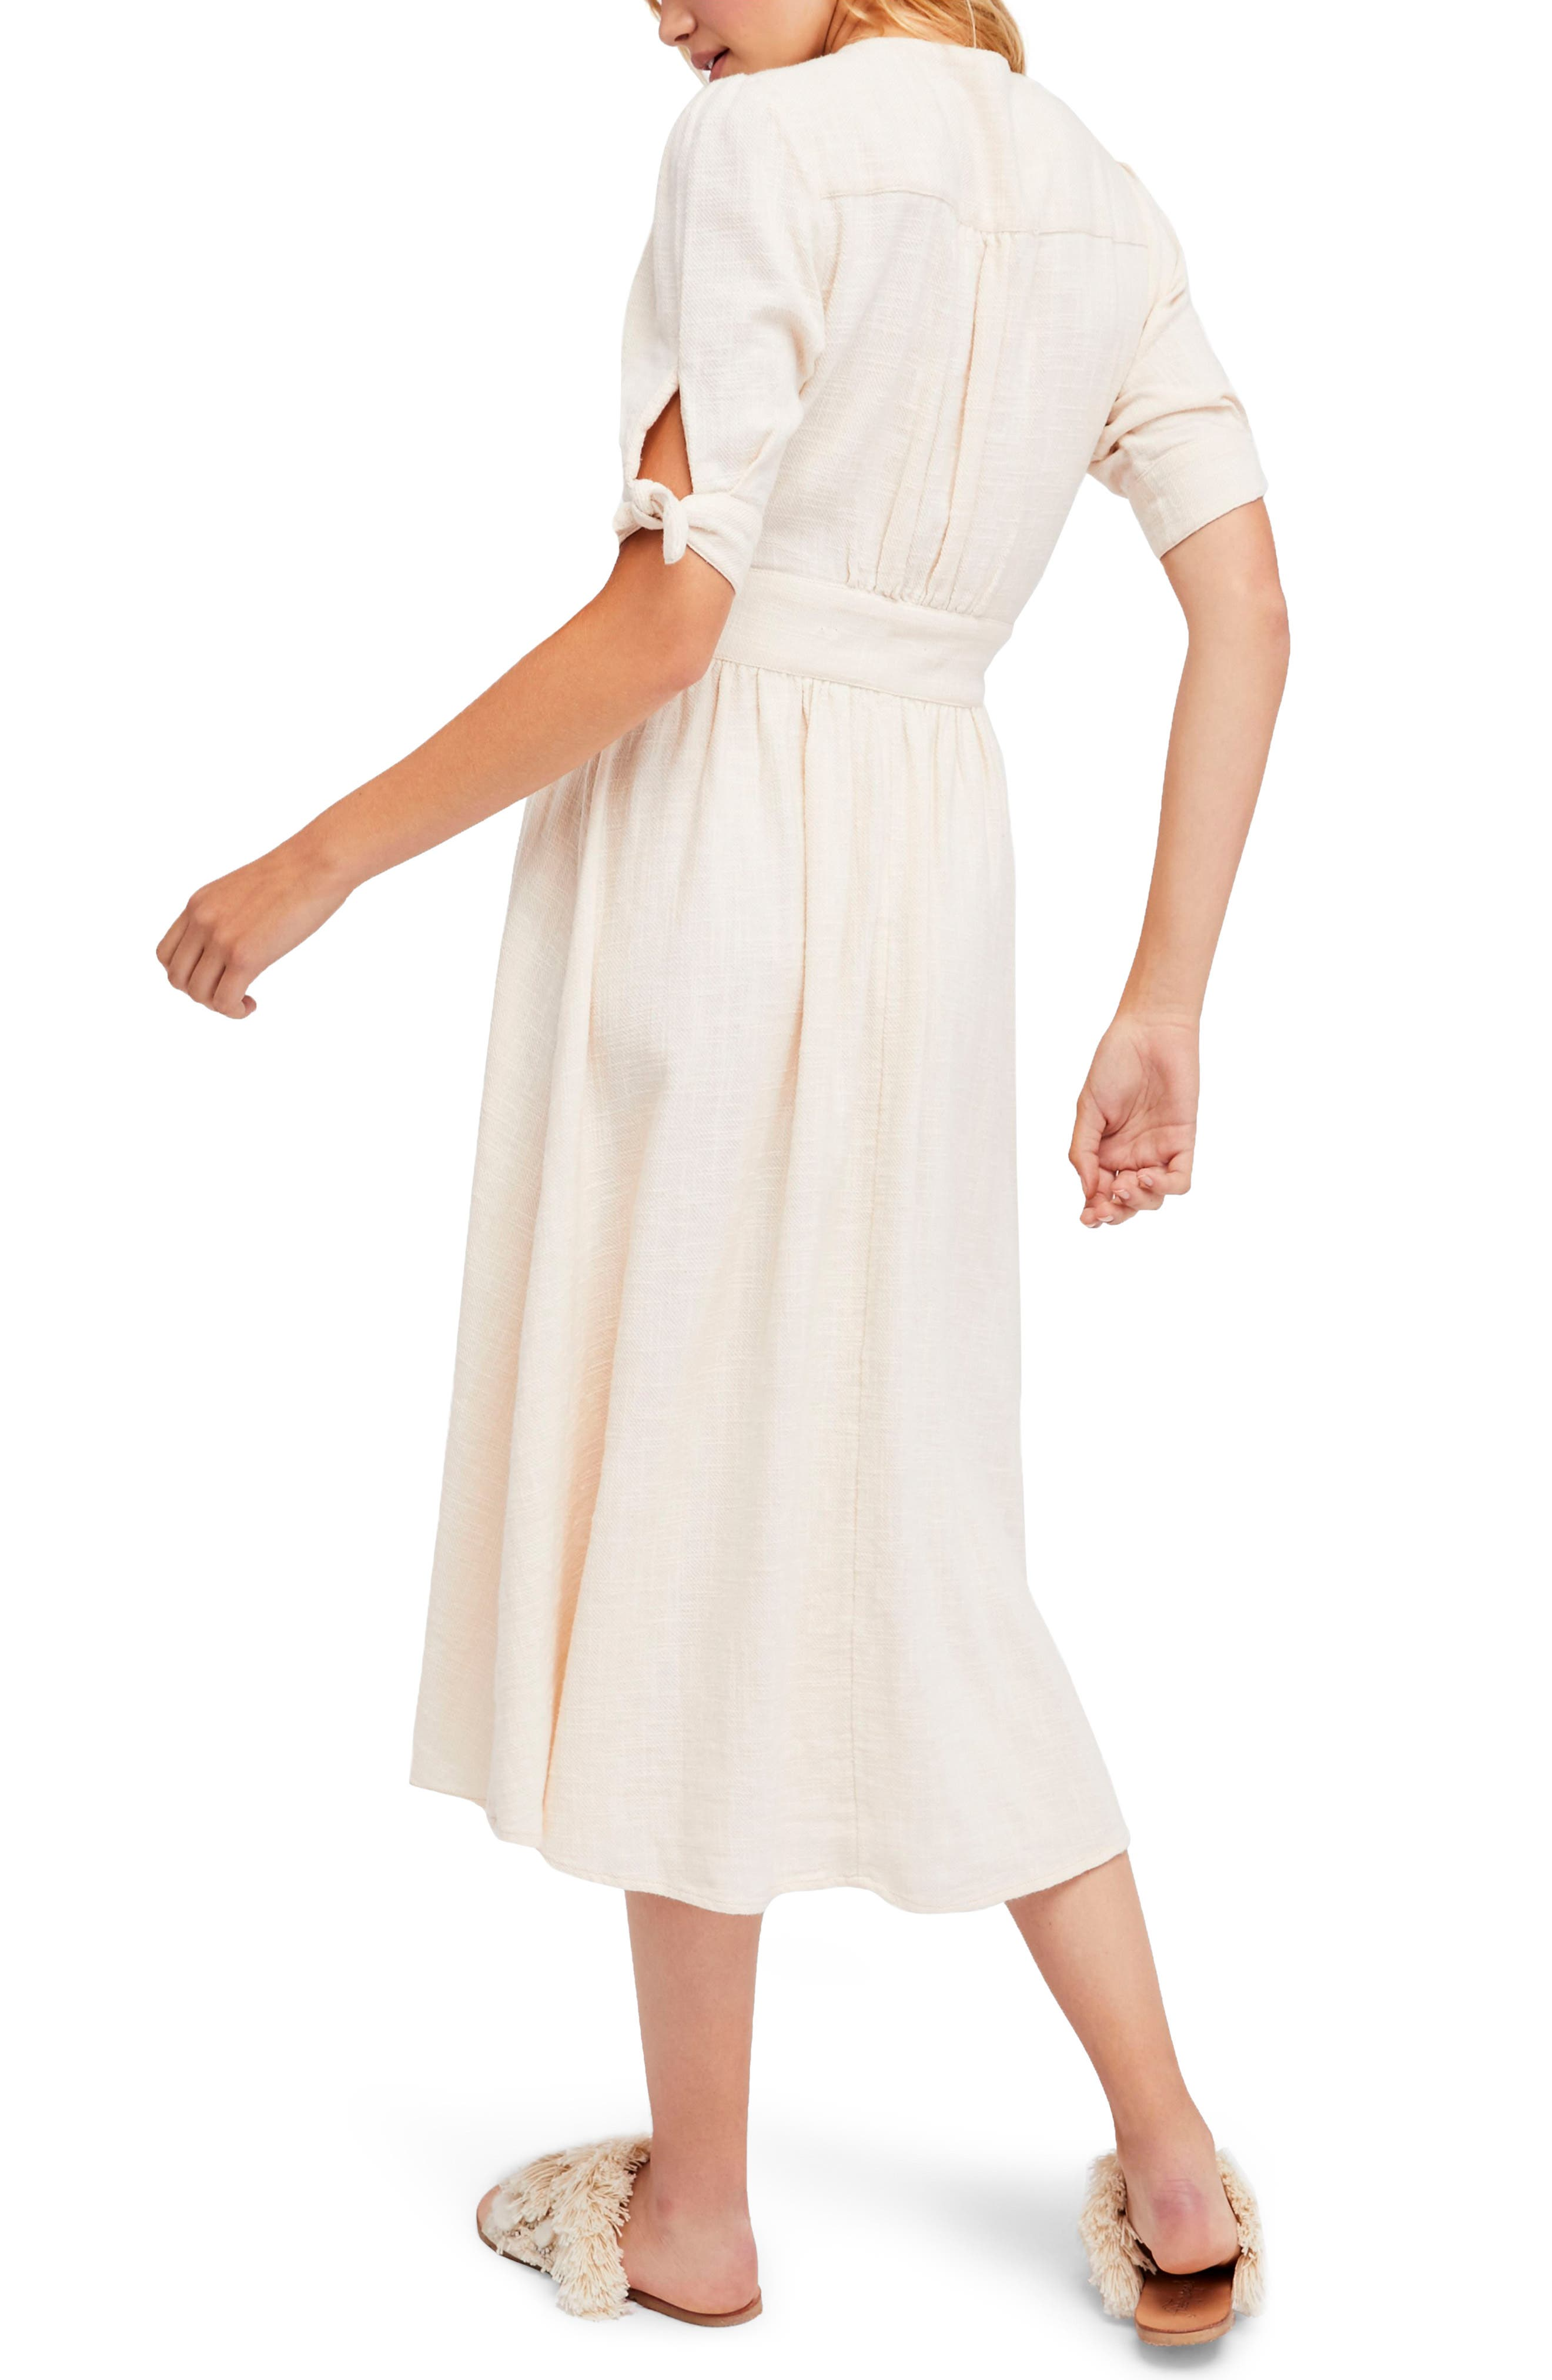 Love of My Life Midi Dress,                             Alternate thumbnail 2, color,                             Ivory